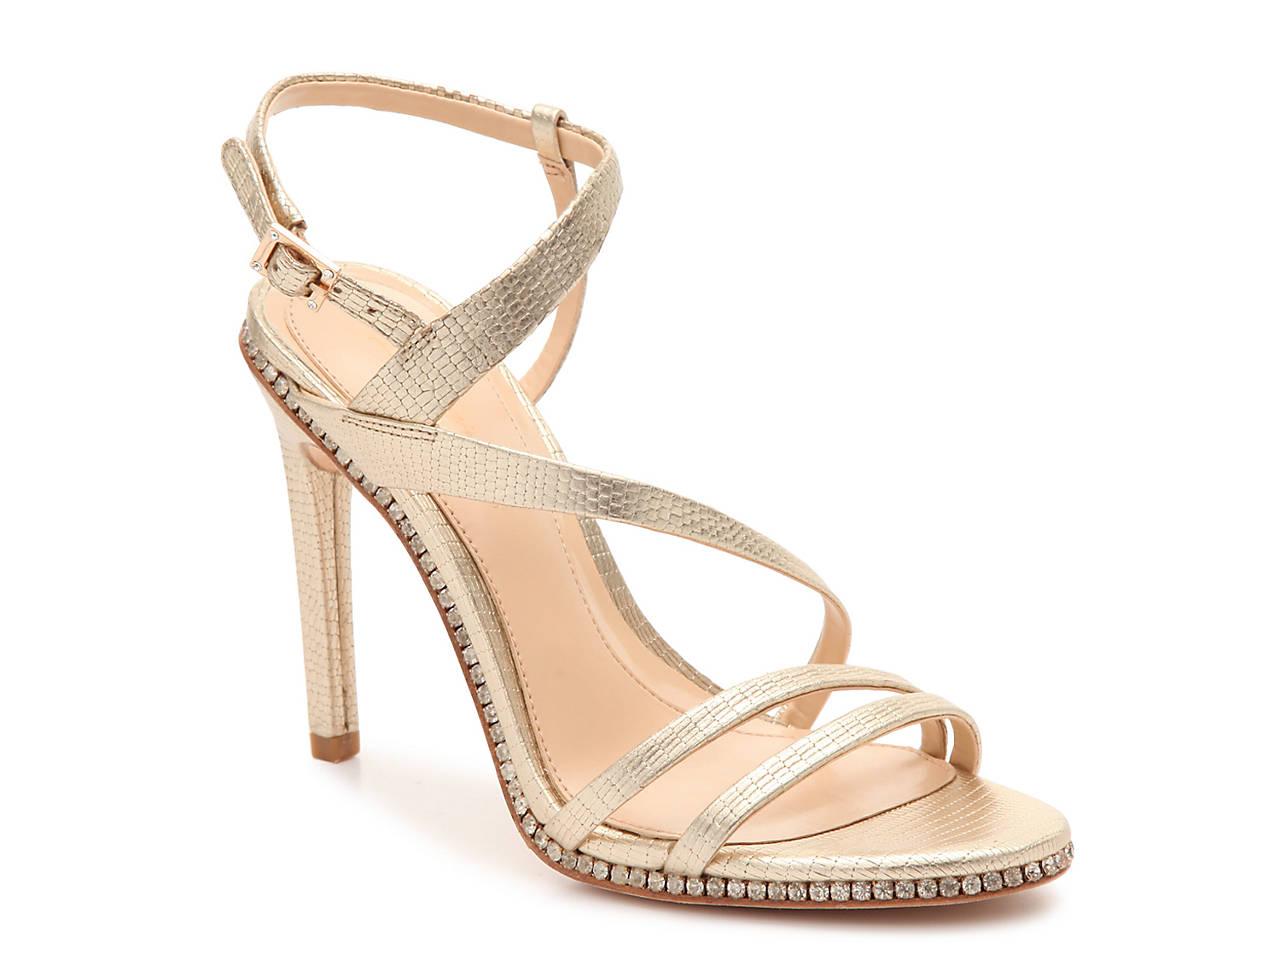 90e9c0048409 Imagine Vince Camuto Gian Sandal Women s Shoes